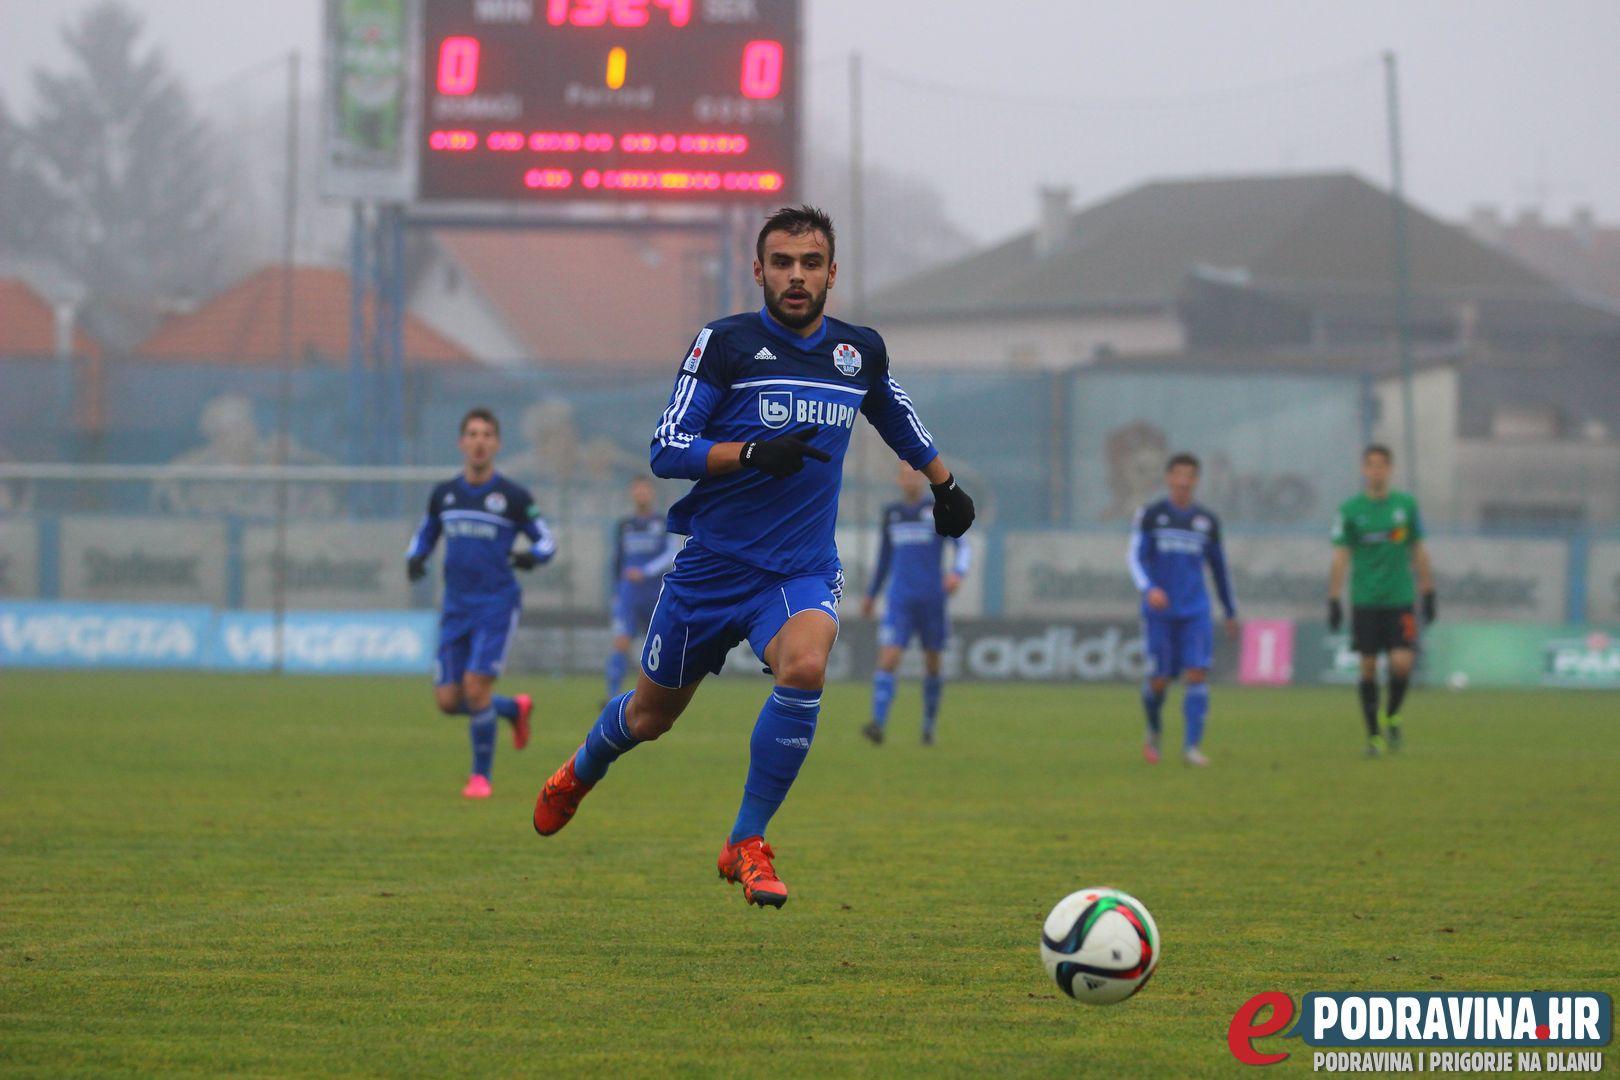 Ejupi runs after the ball